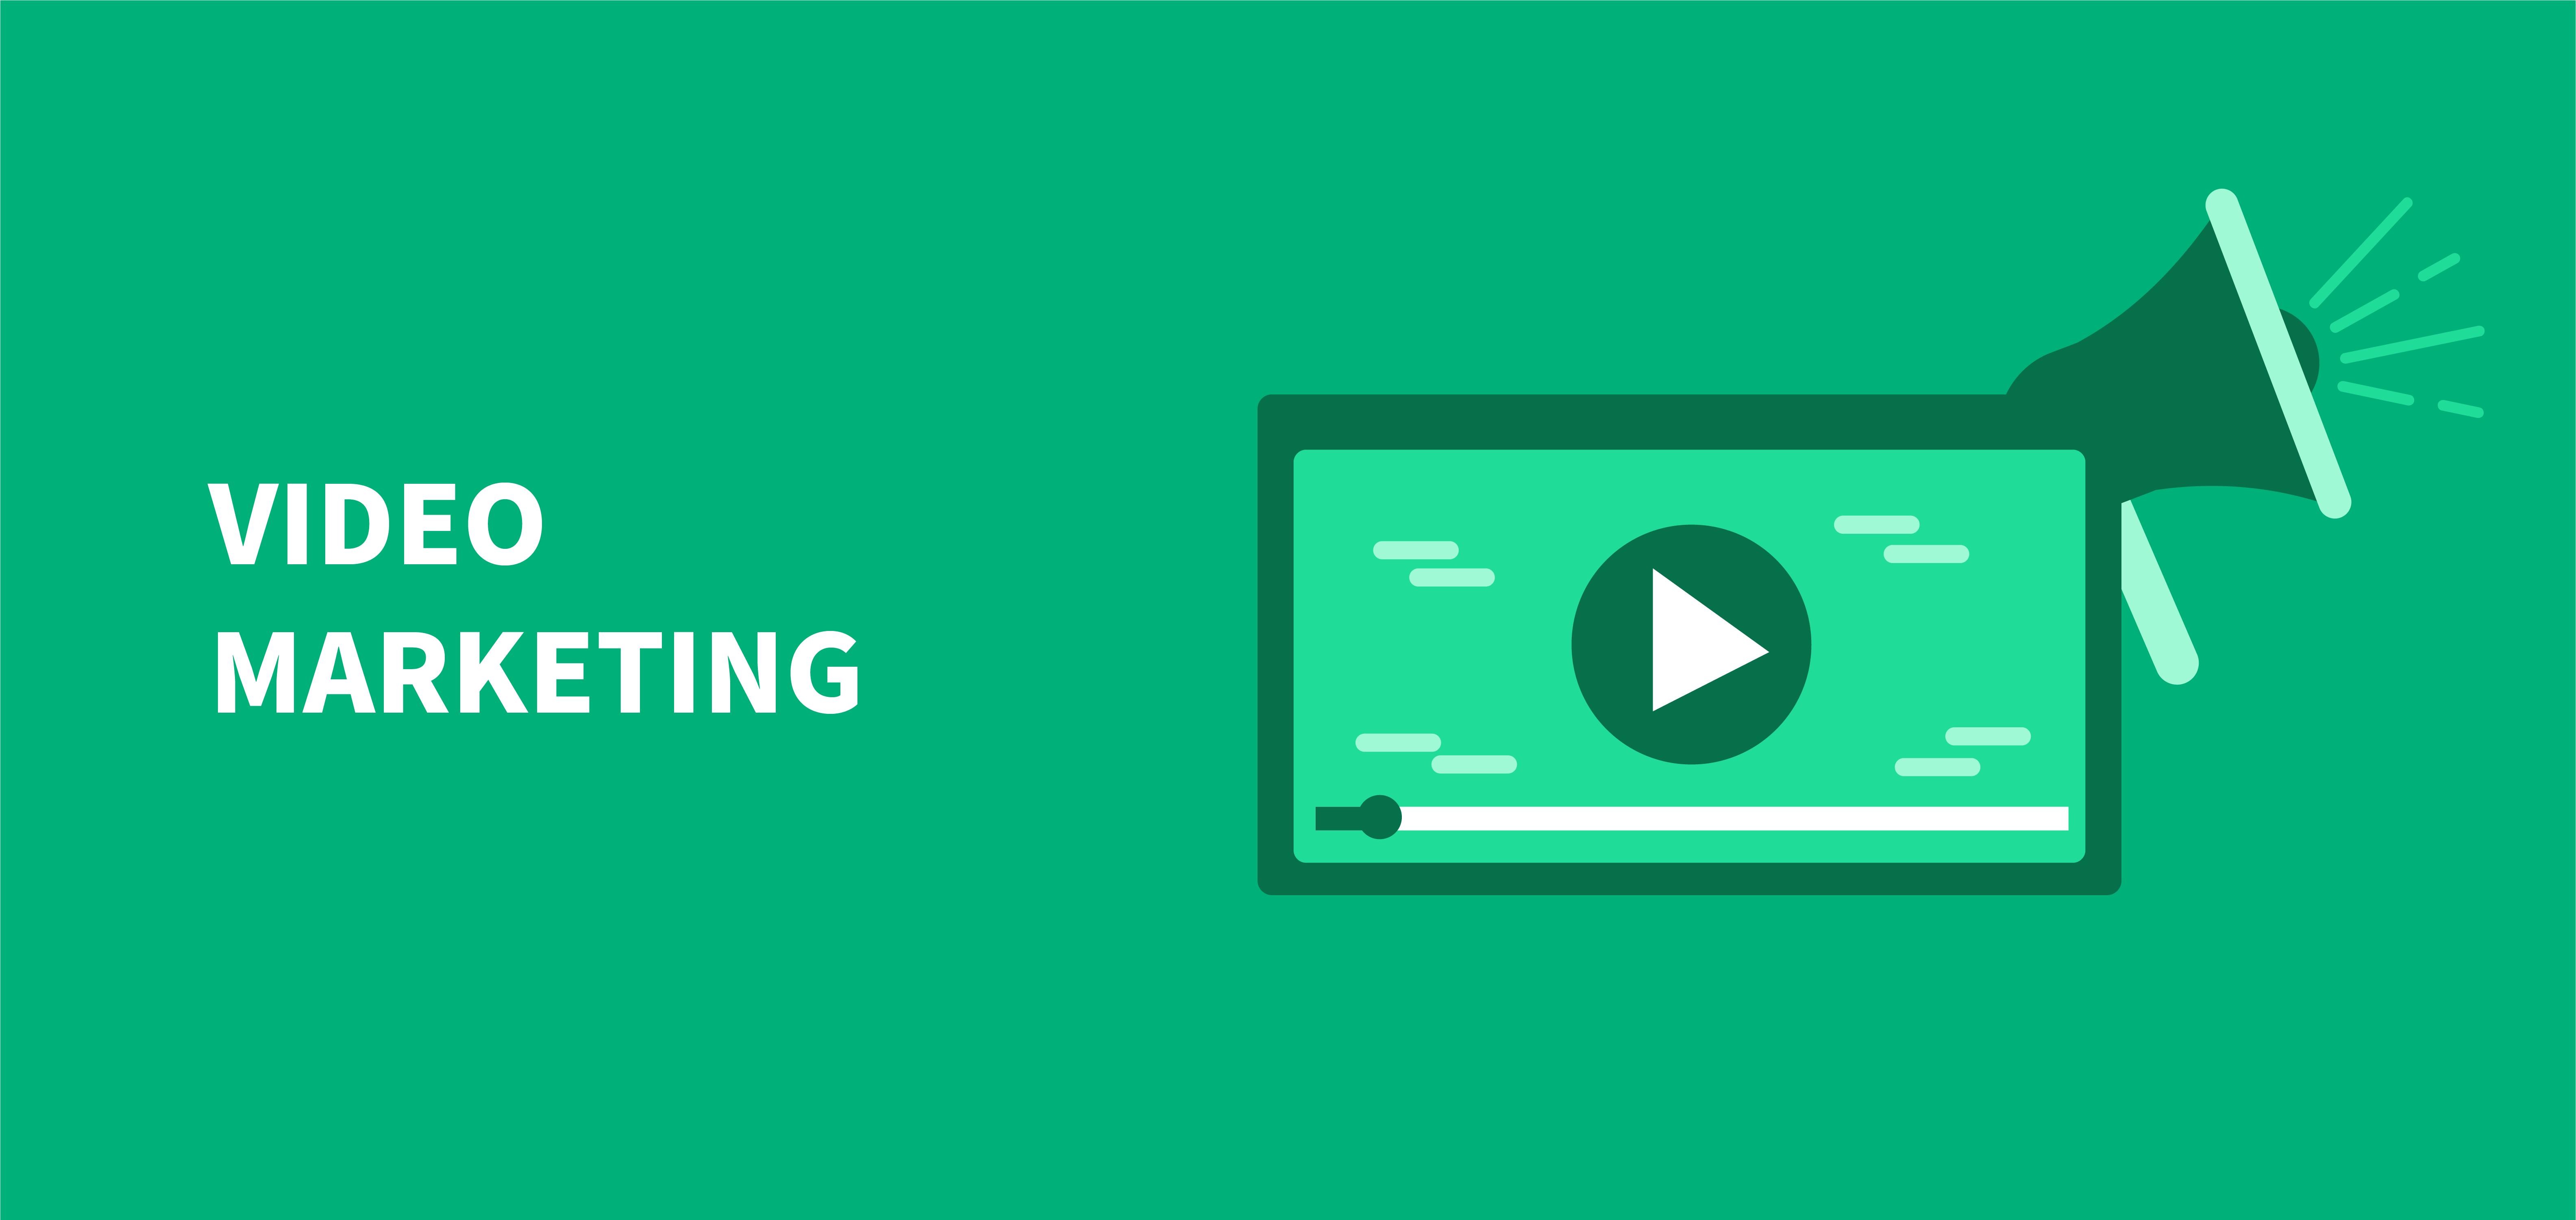 Marketing trends: Video Marketing